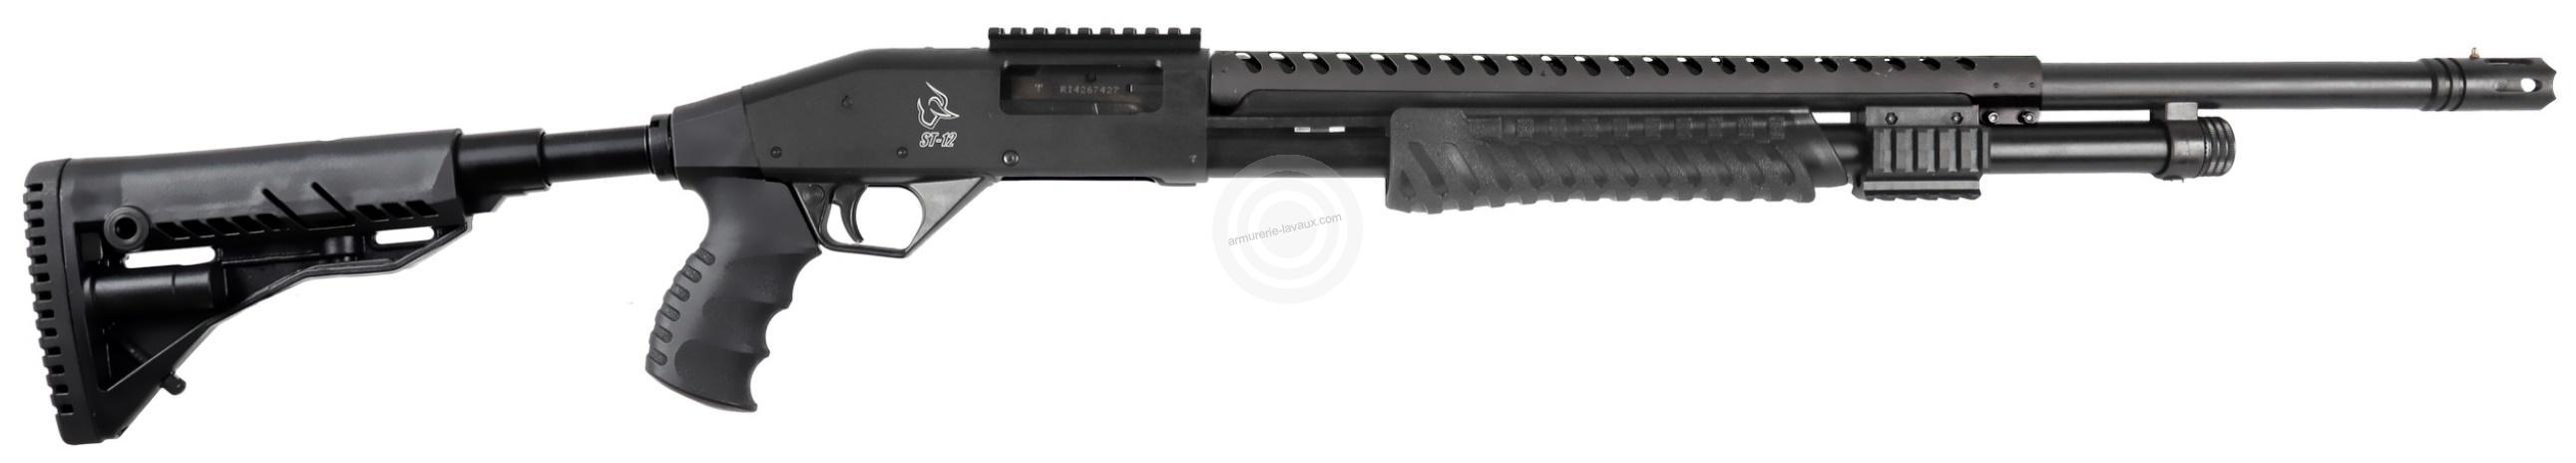 Fusil à pompe TAURUS ST12 Tactical cal.12/76